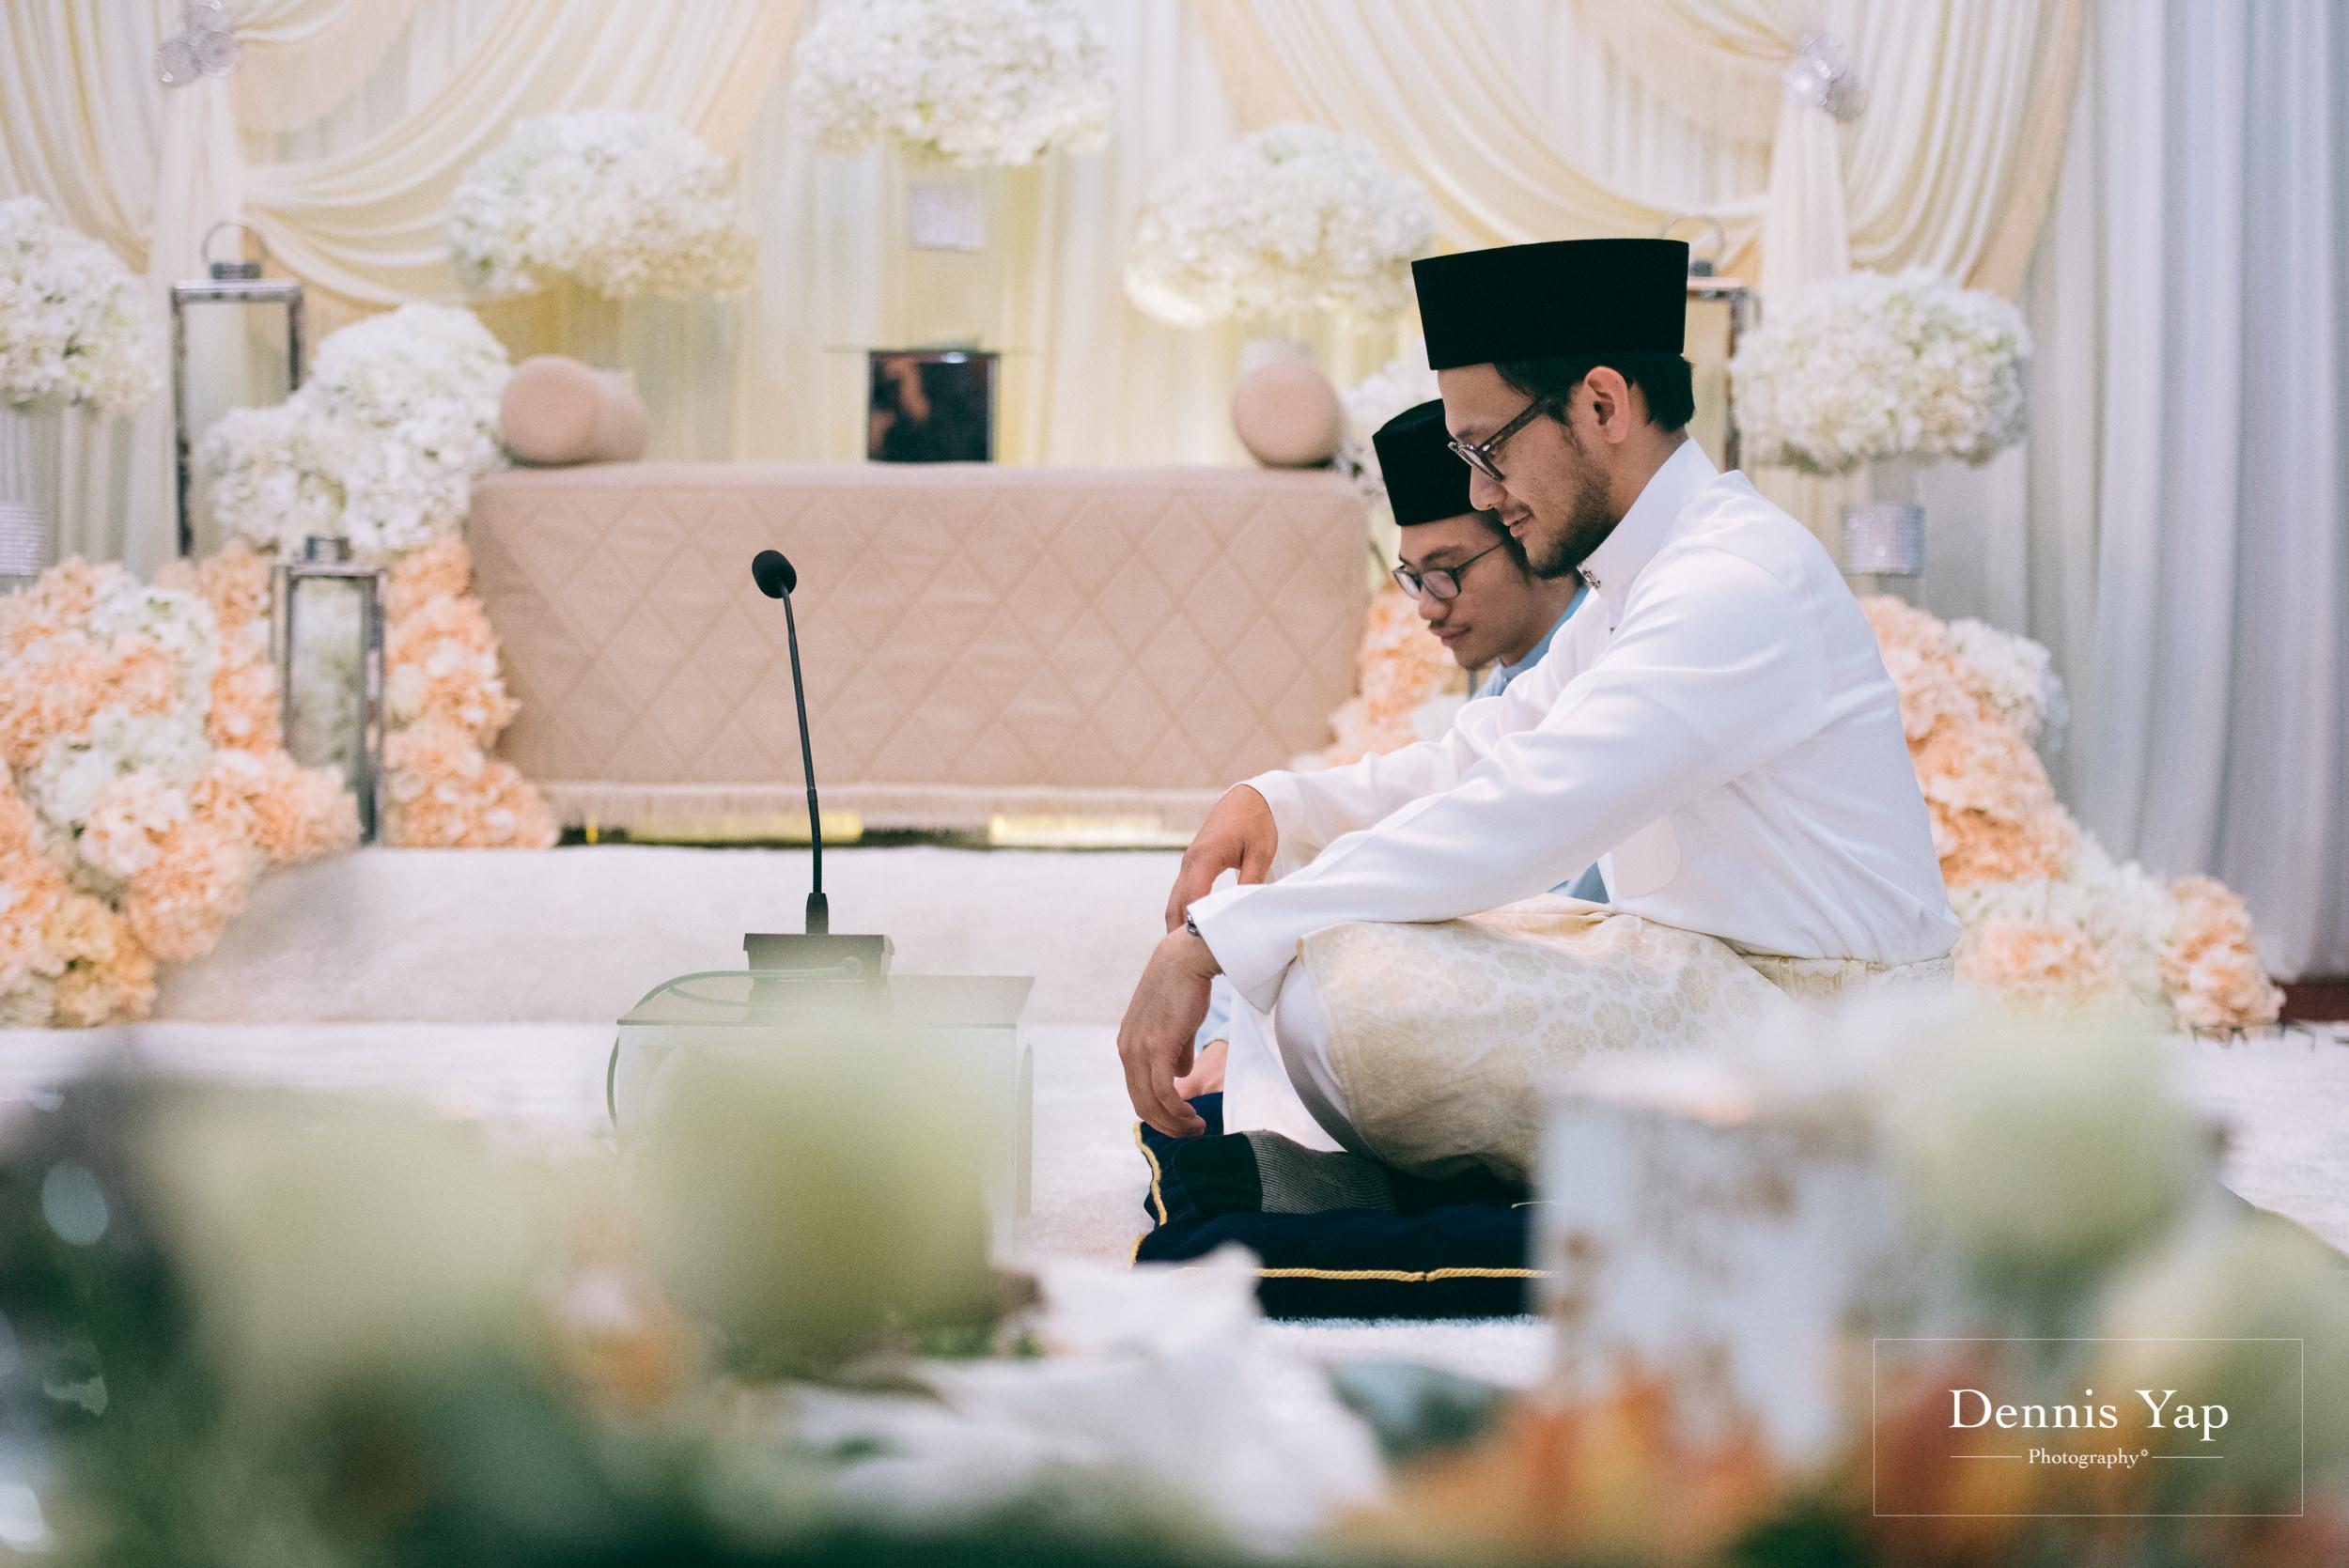 zarif hanalili malay wedding ceremony dennis yap photography-14.jpg